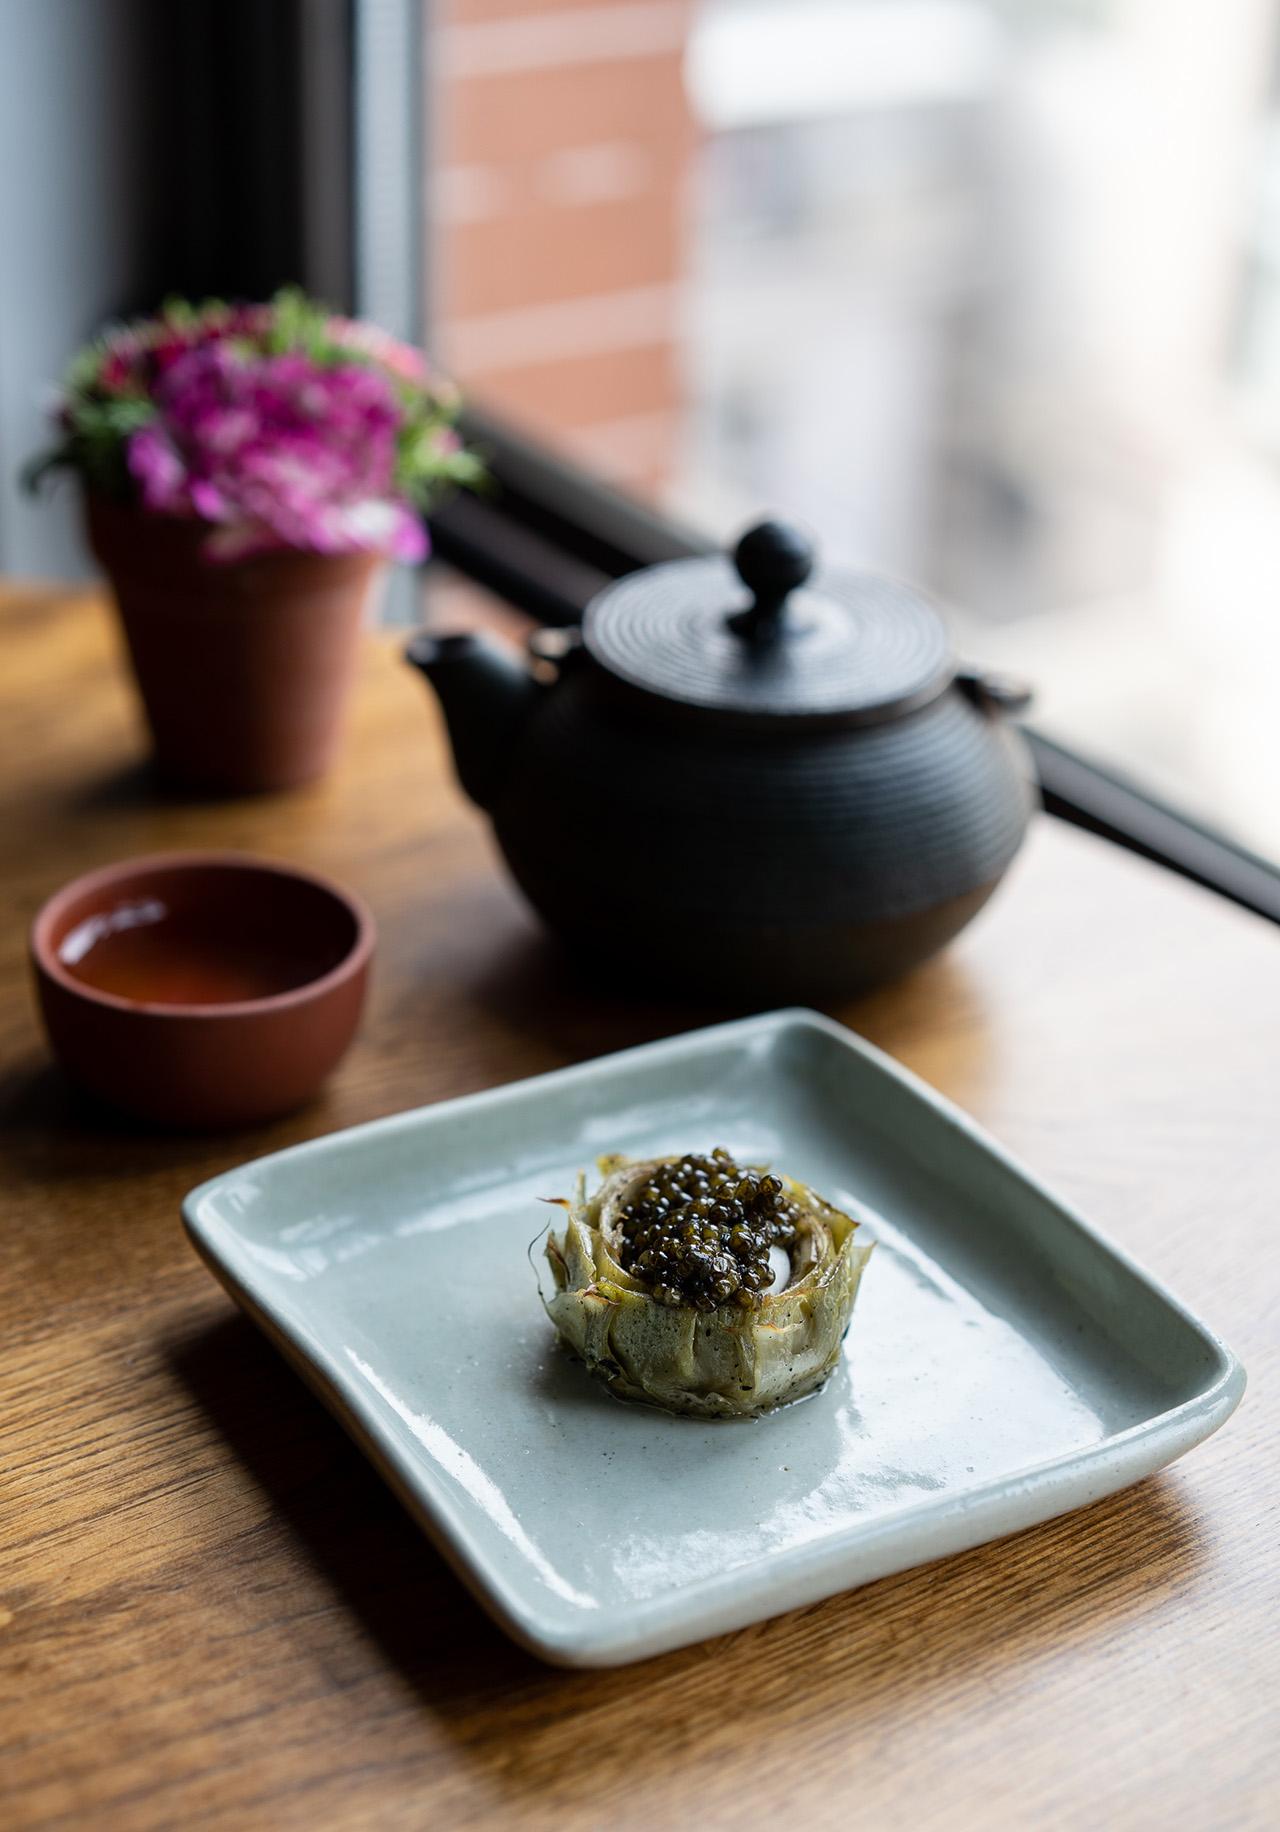 Caviar wrapped in artichoke.